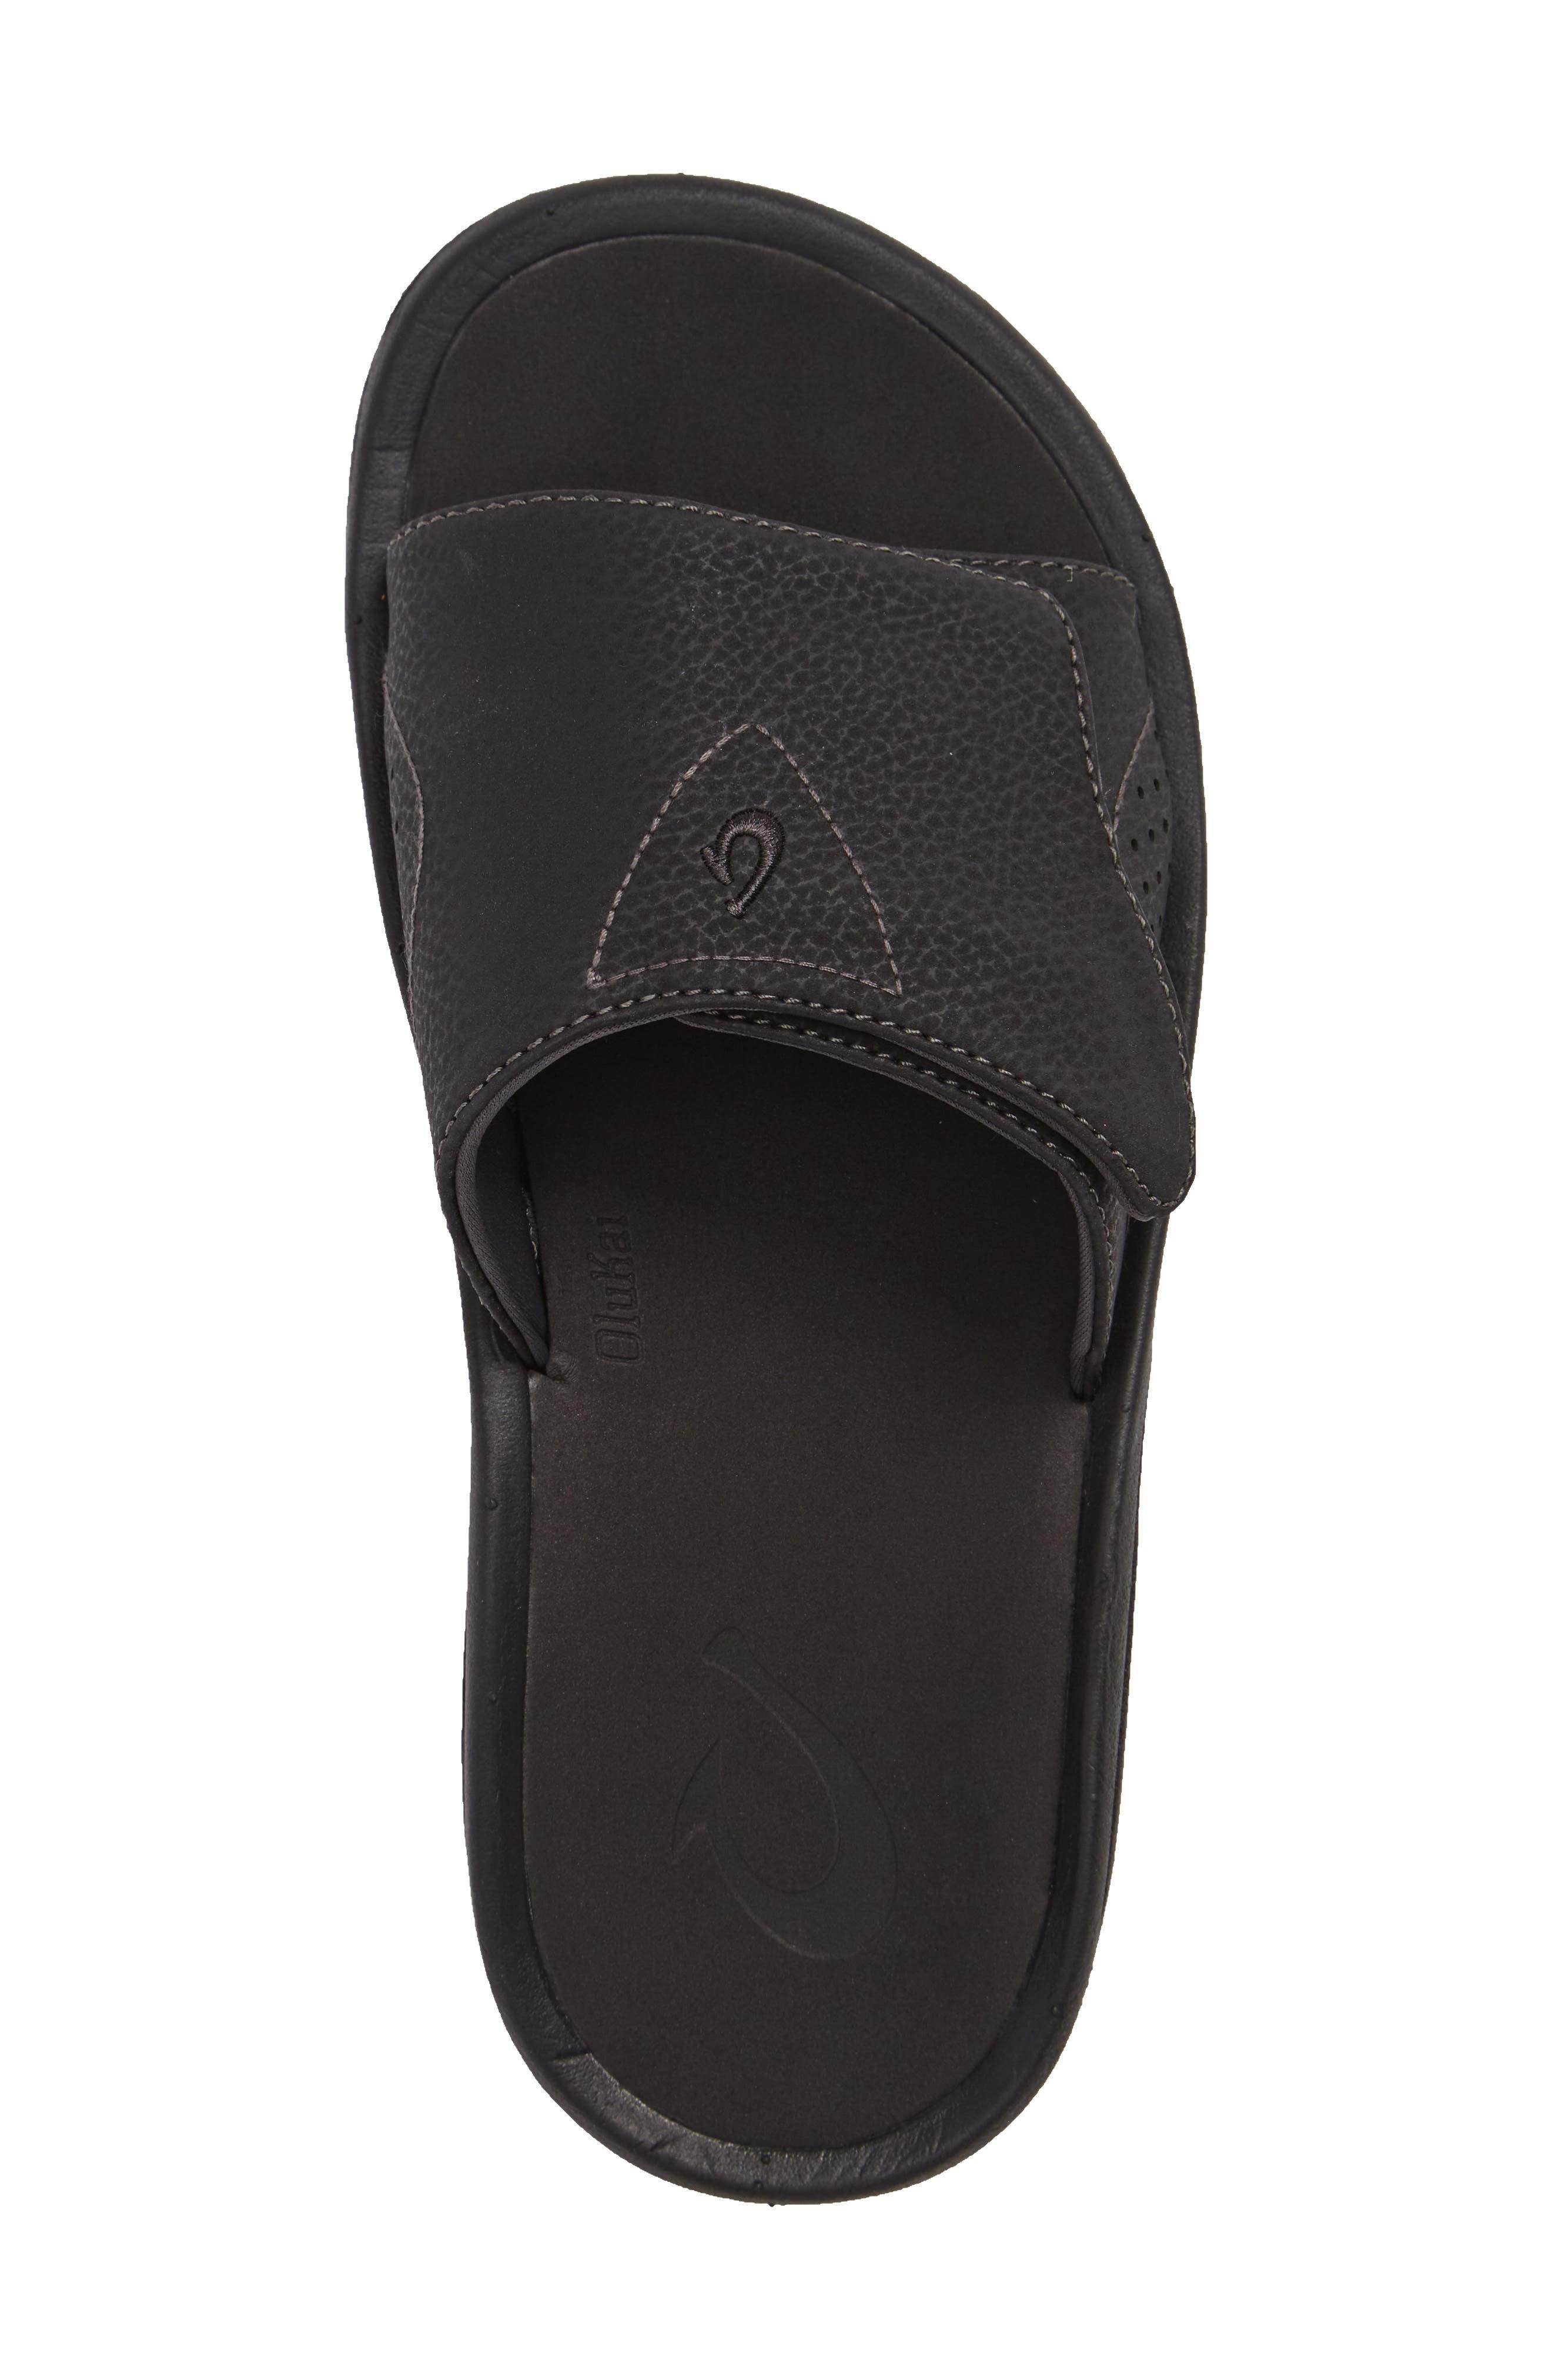 Nalu Slide Sandal,                             Alternate thumbnail 3, color,                             BLACK/ BLACK